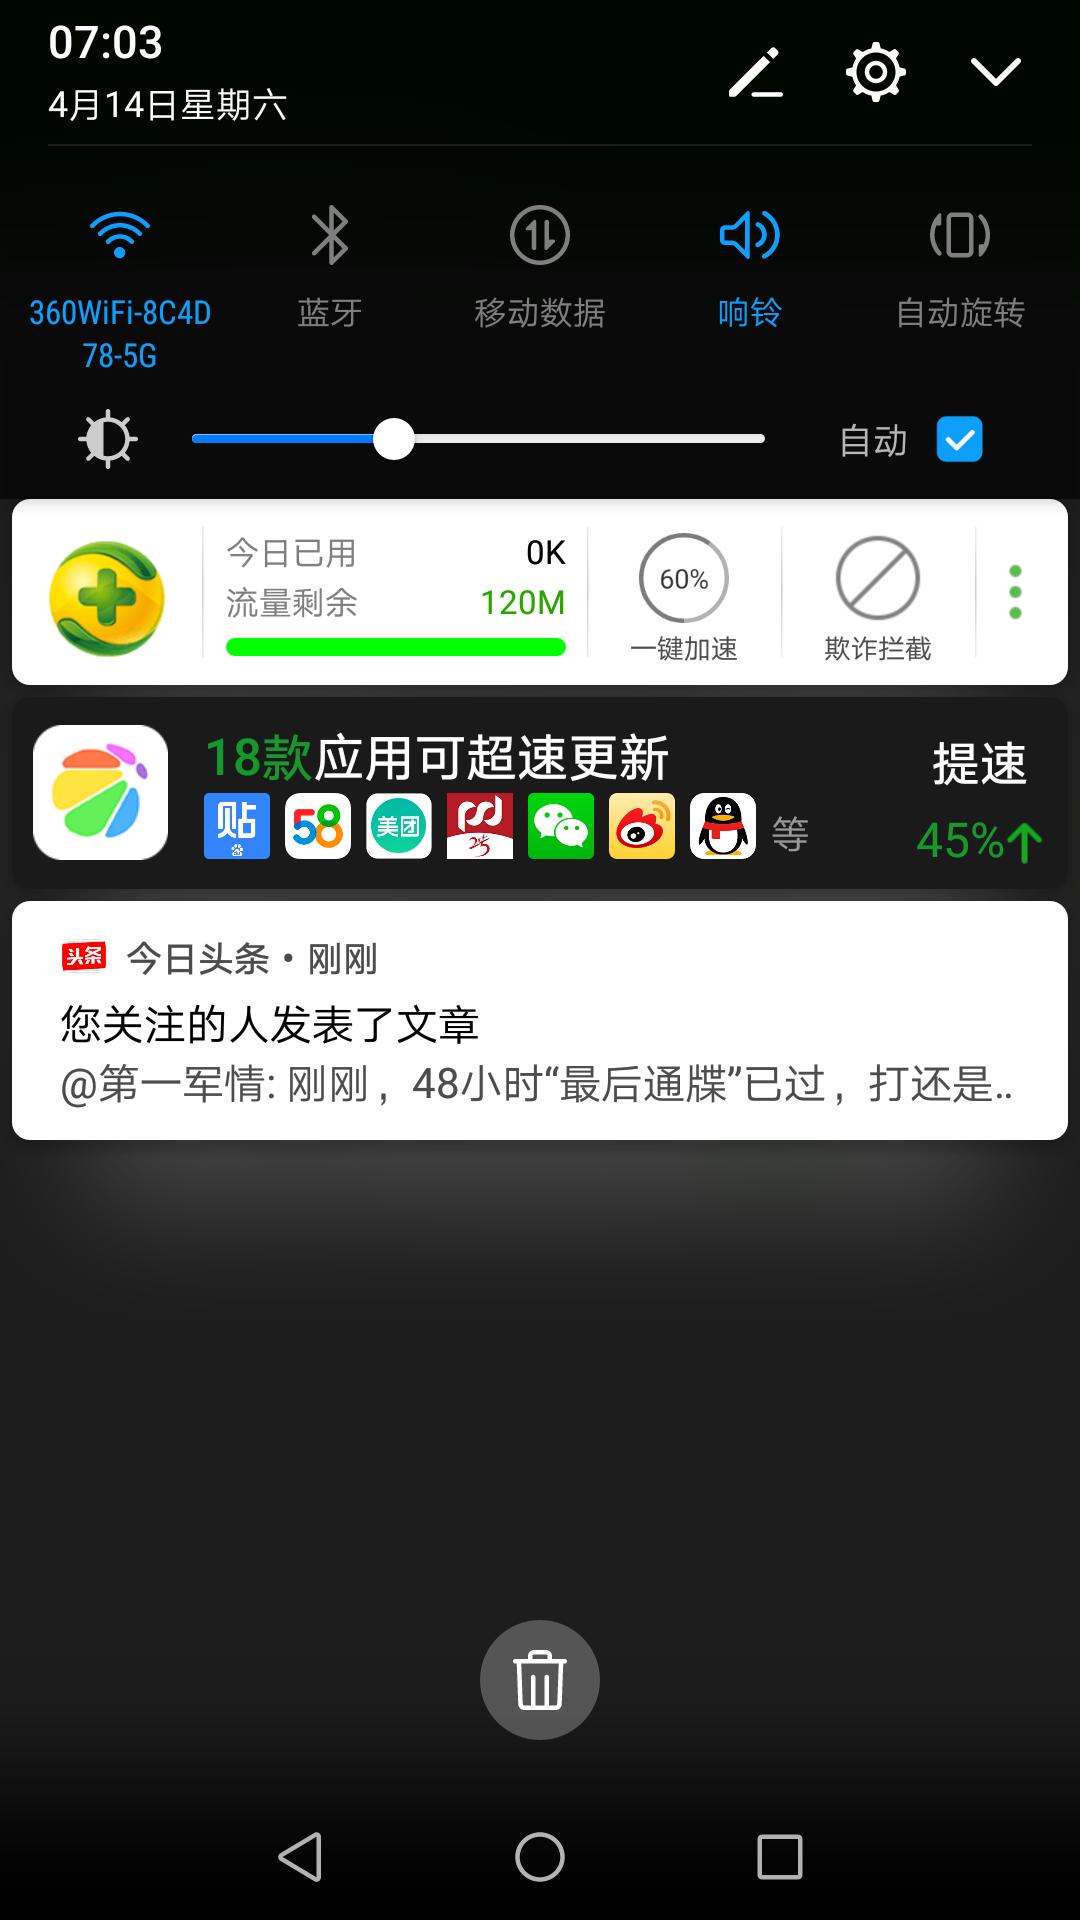 Screenshot_20180414-070301.png